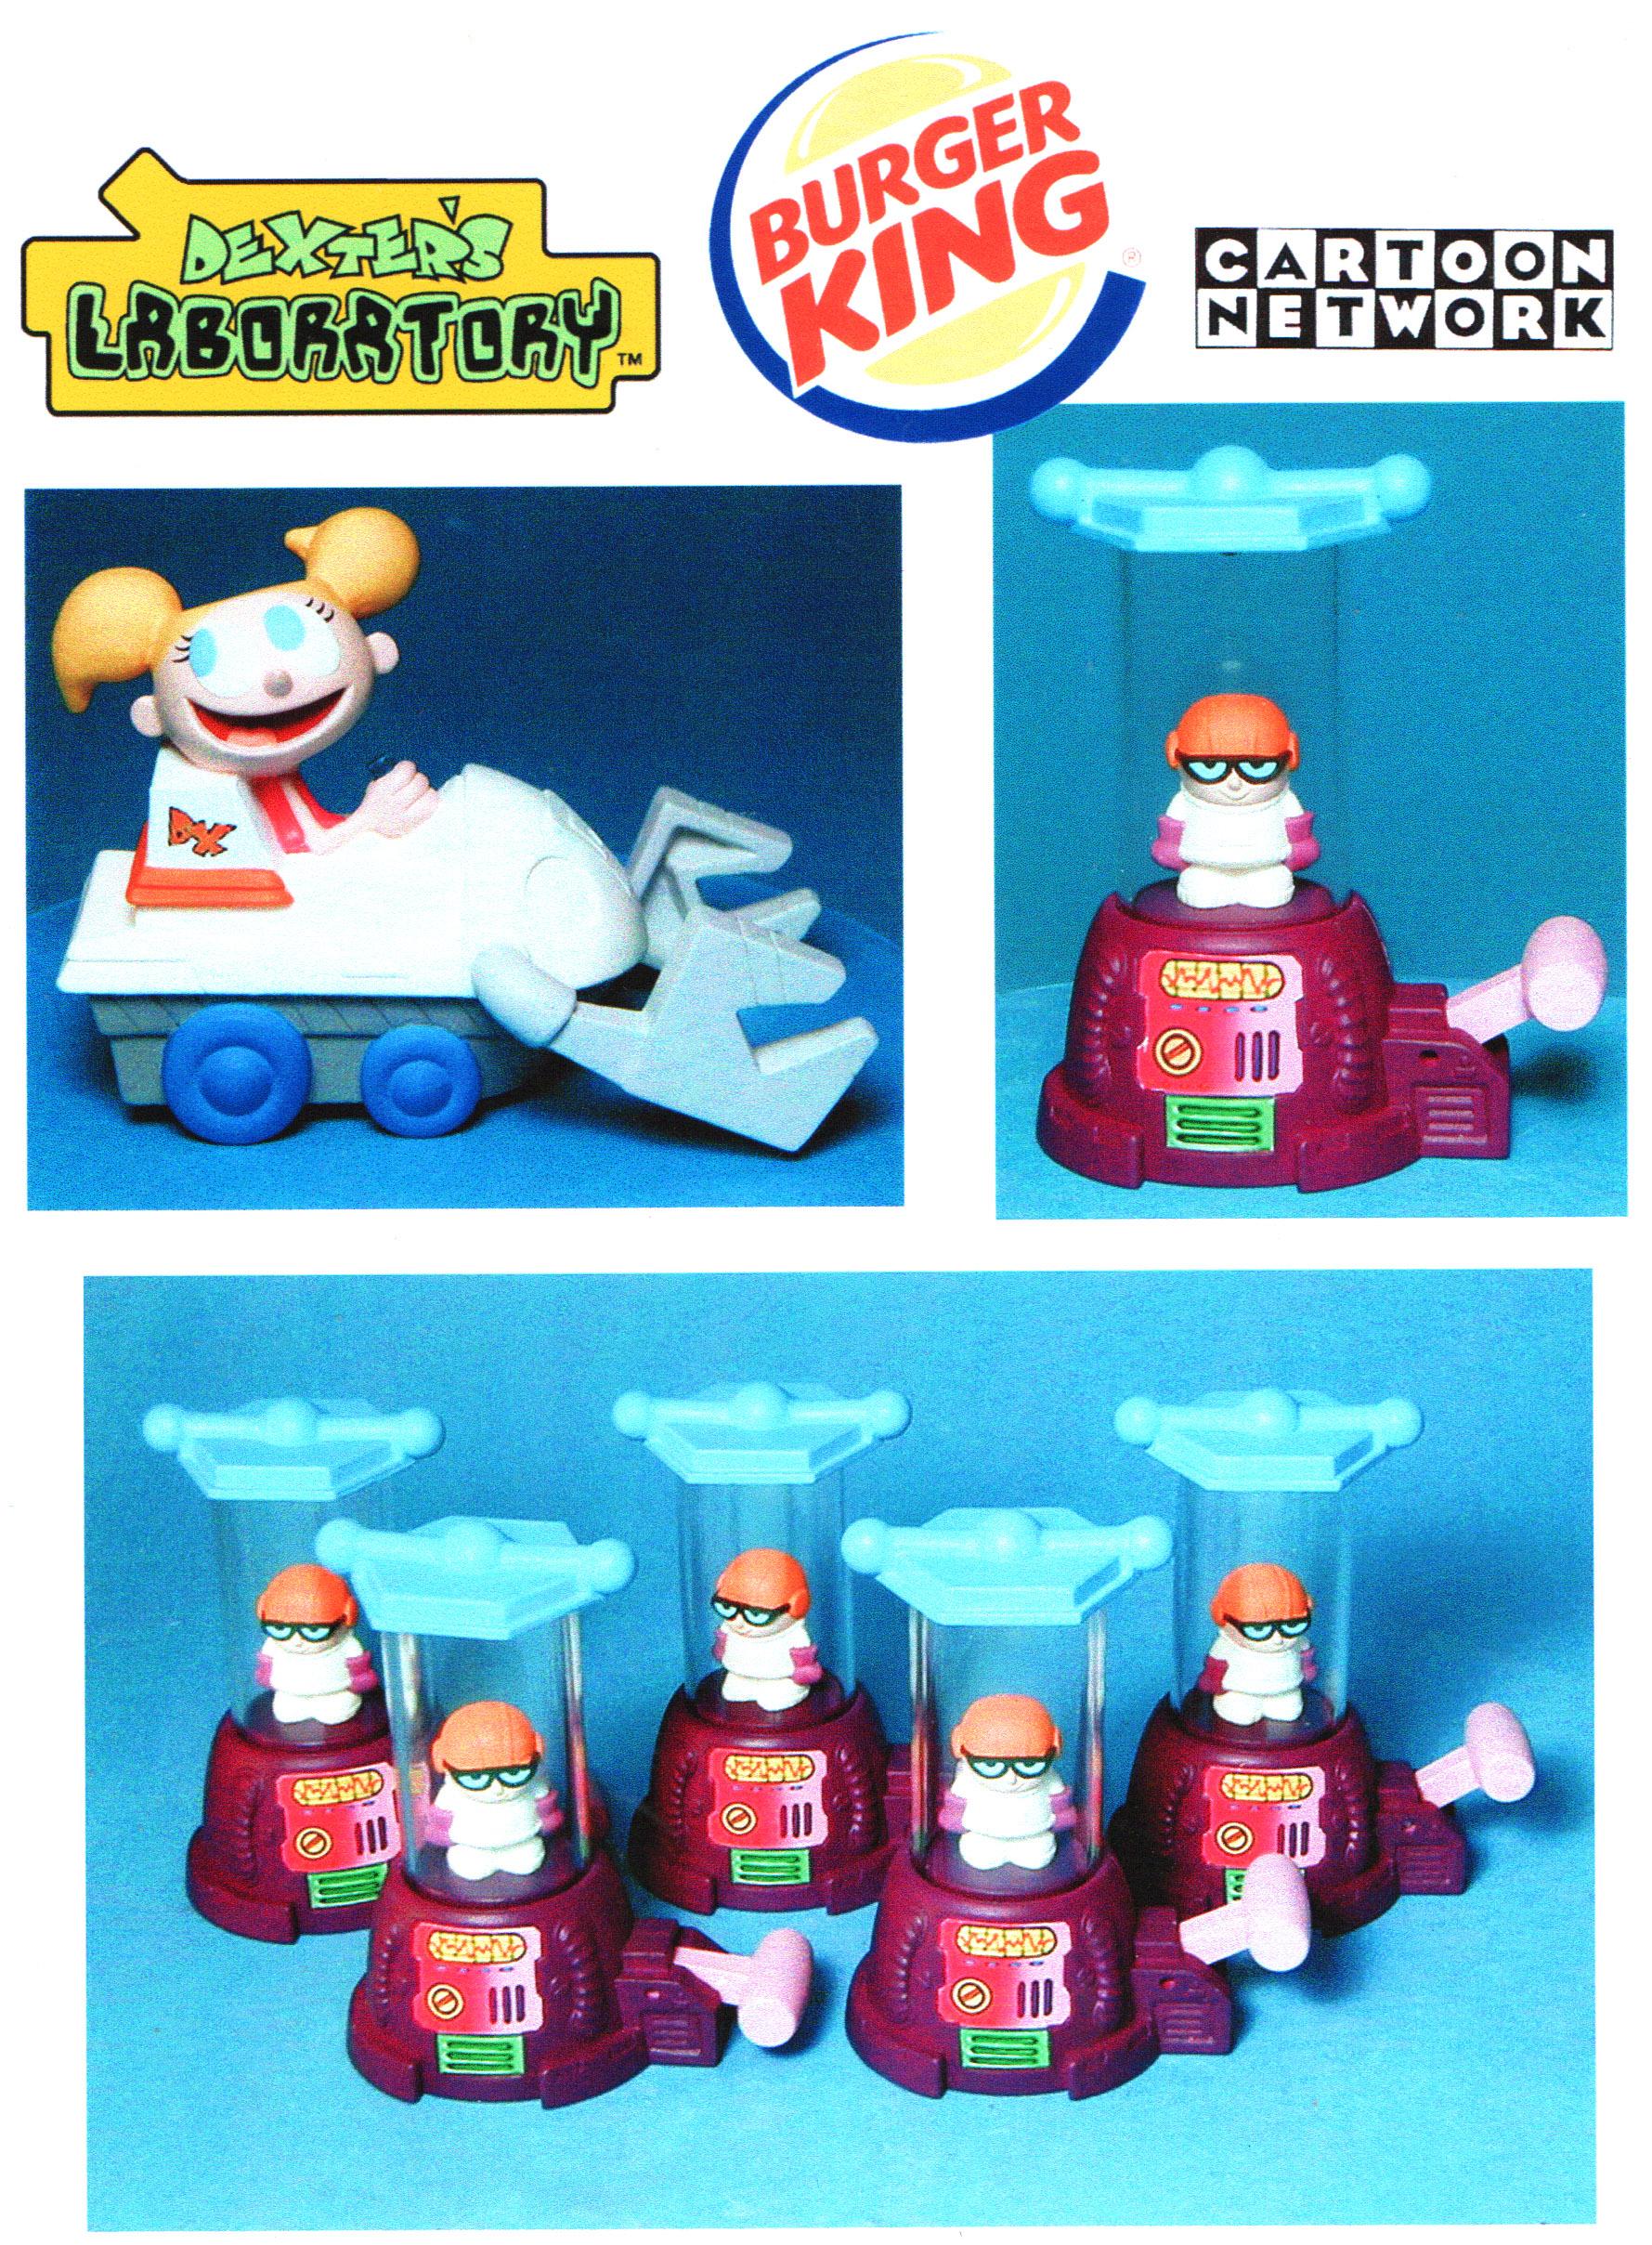 Dexter's Lab Kid's Meal, Burger King